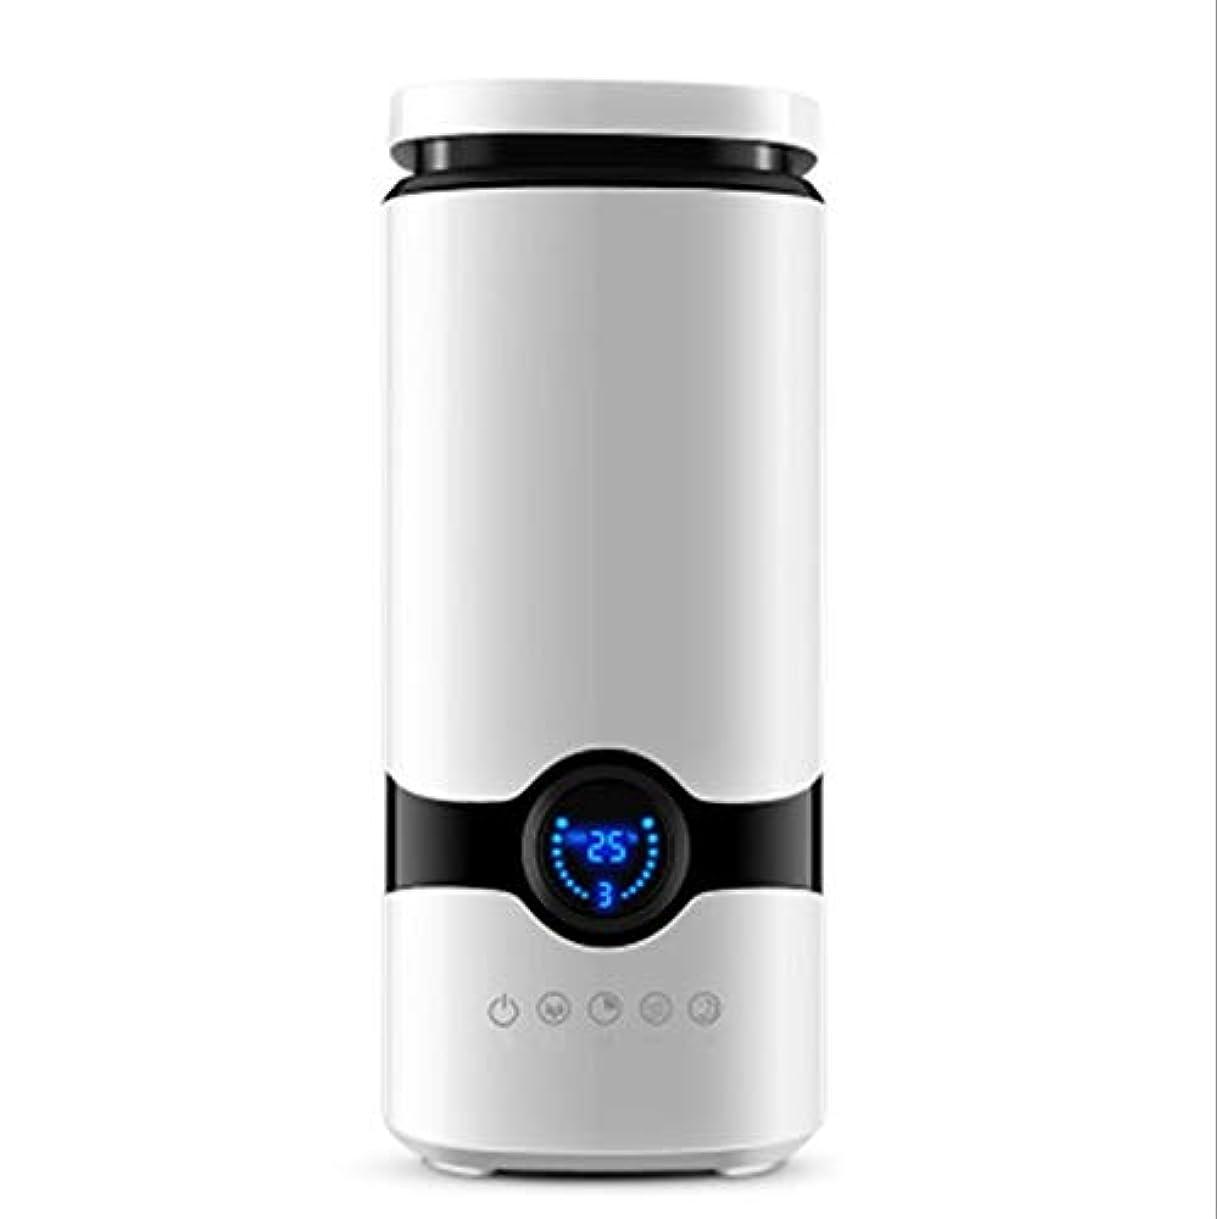 4-6Lコールドミスト加湿器、40㎡寝室用超音波加湿器、大容量蒸発器、静かな自動閉鎖ディフューザー (Color : White)